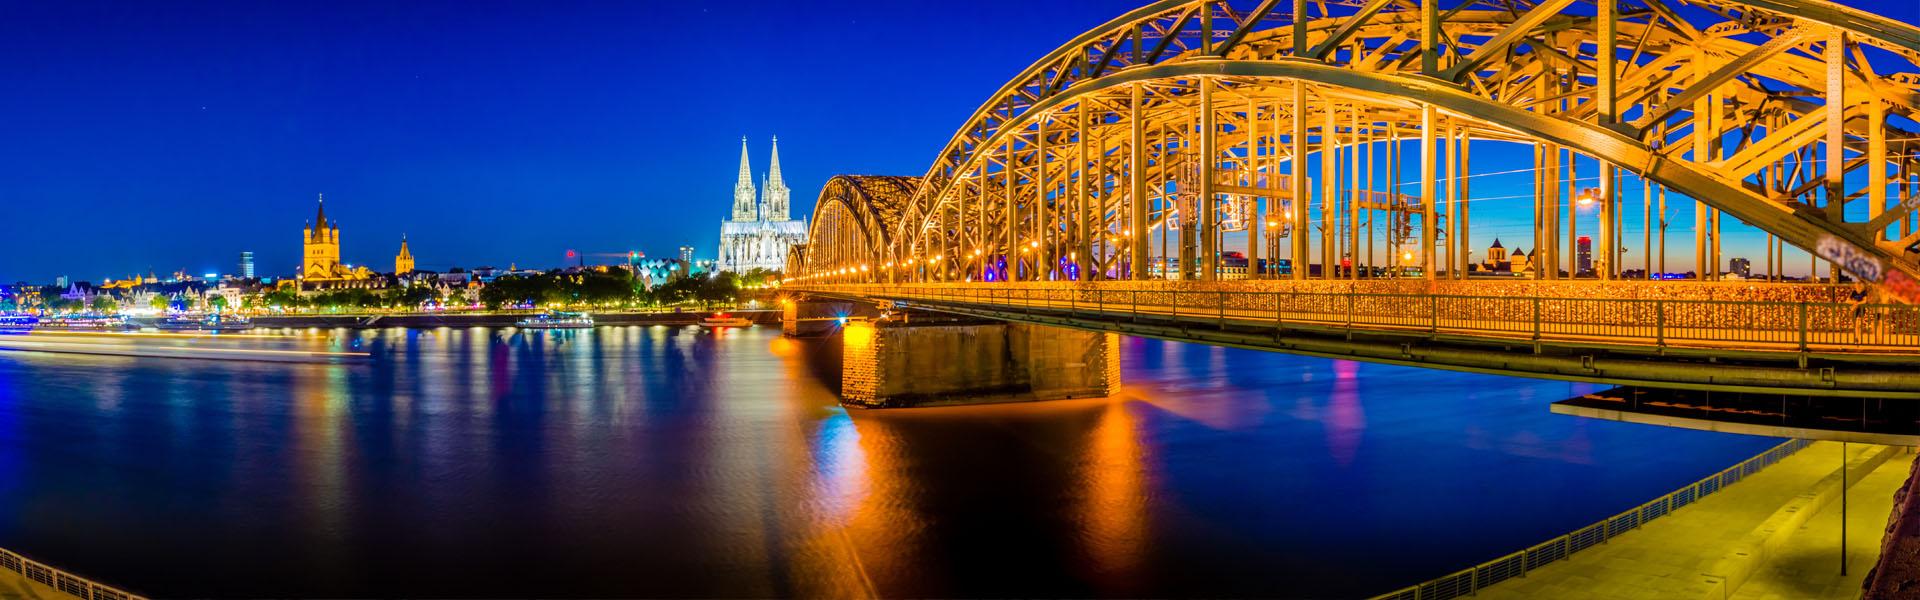 Brücke in Köln am Rhein